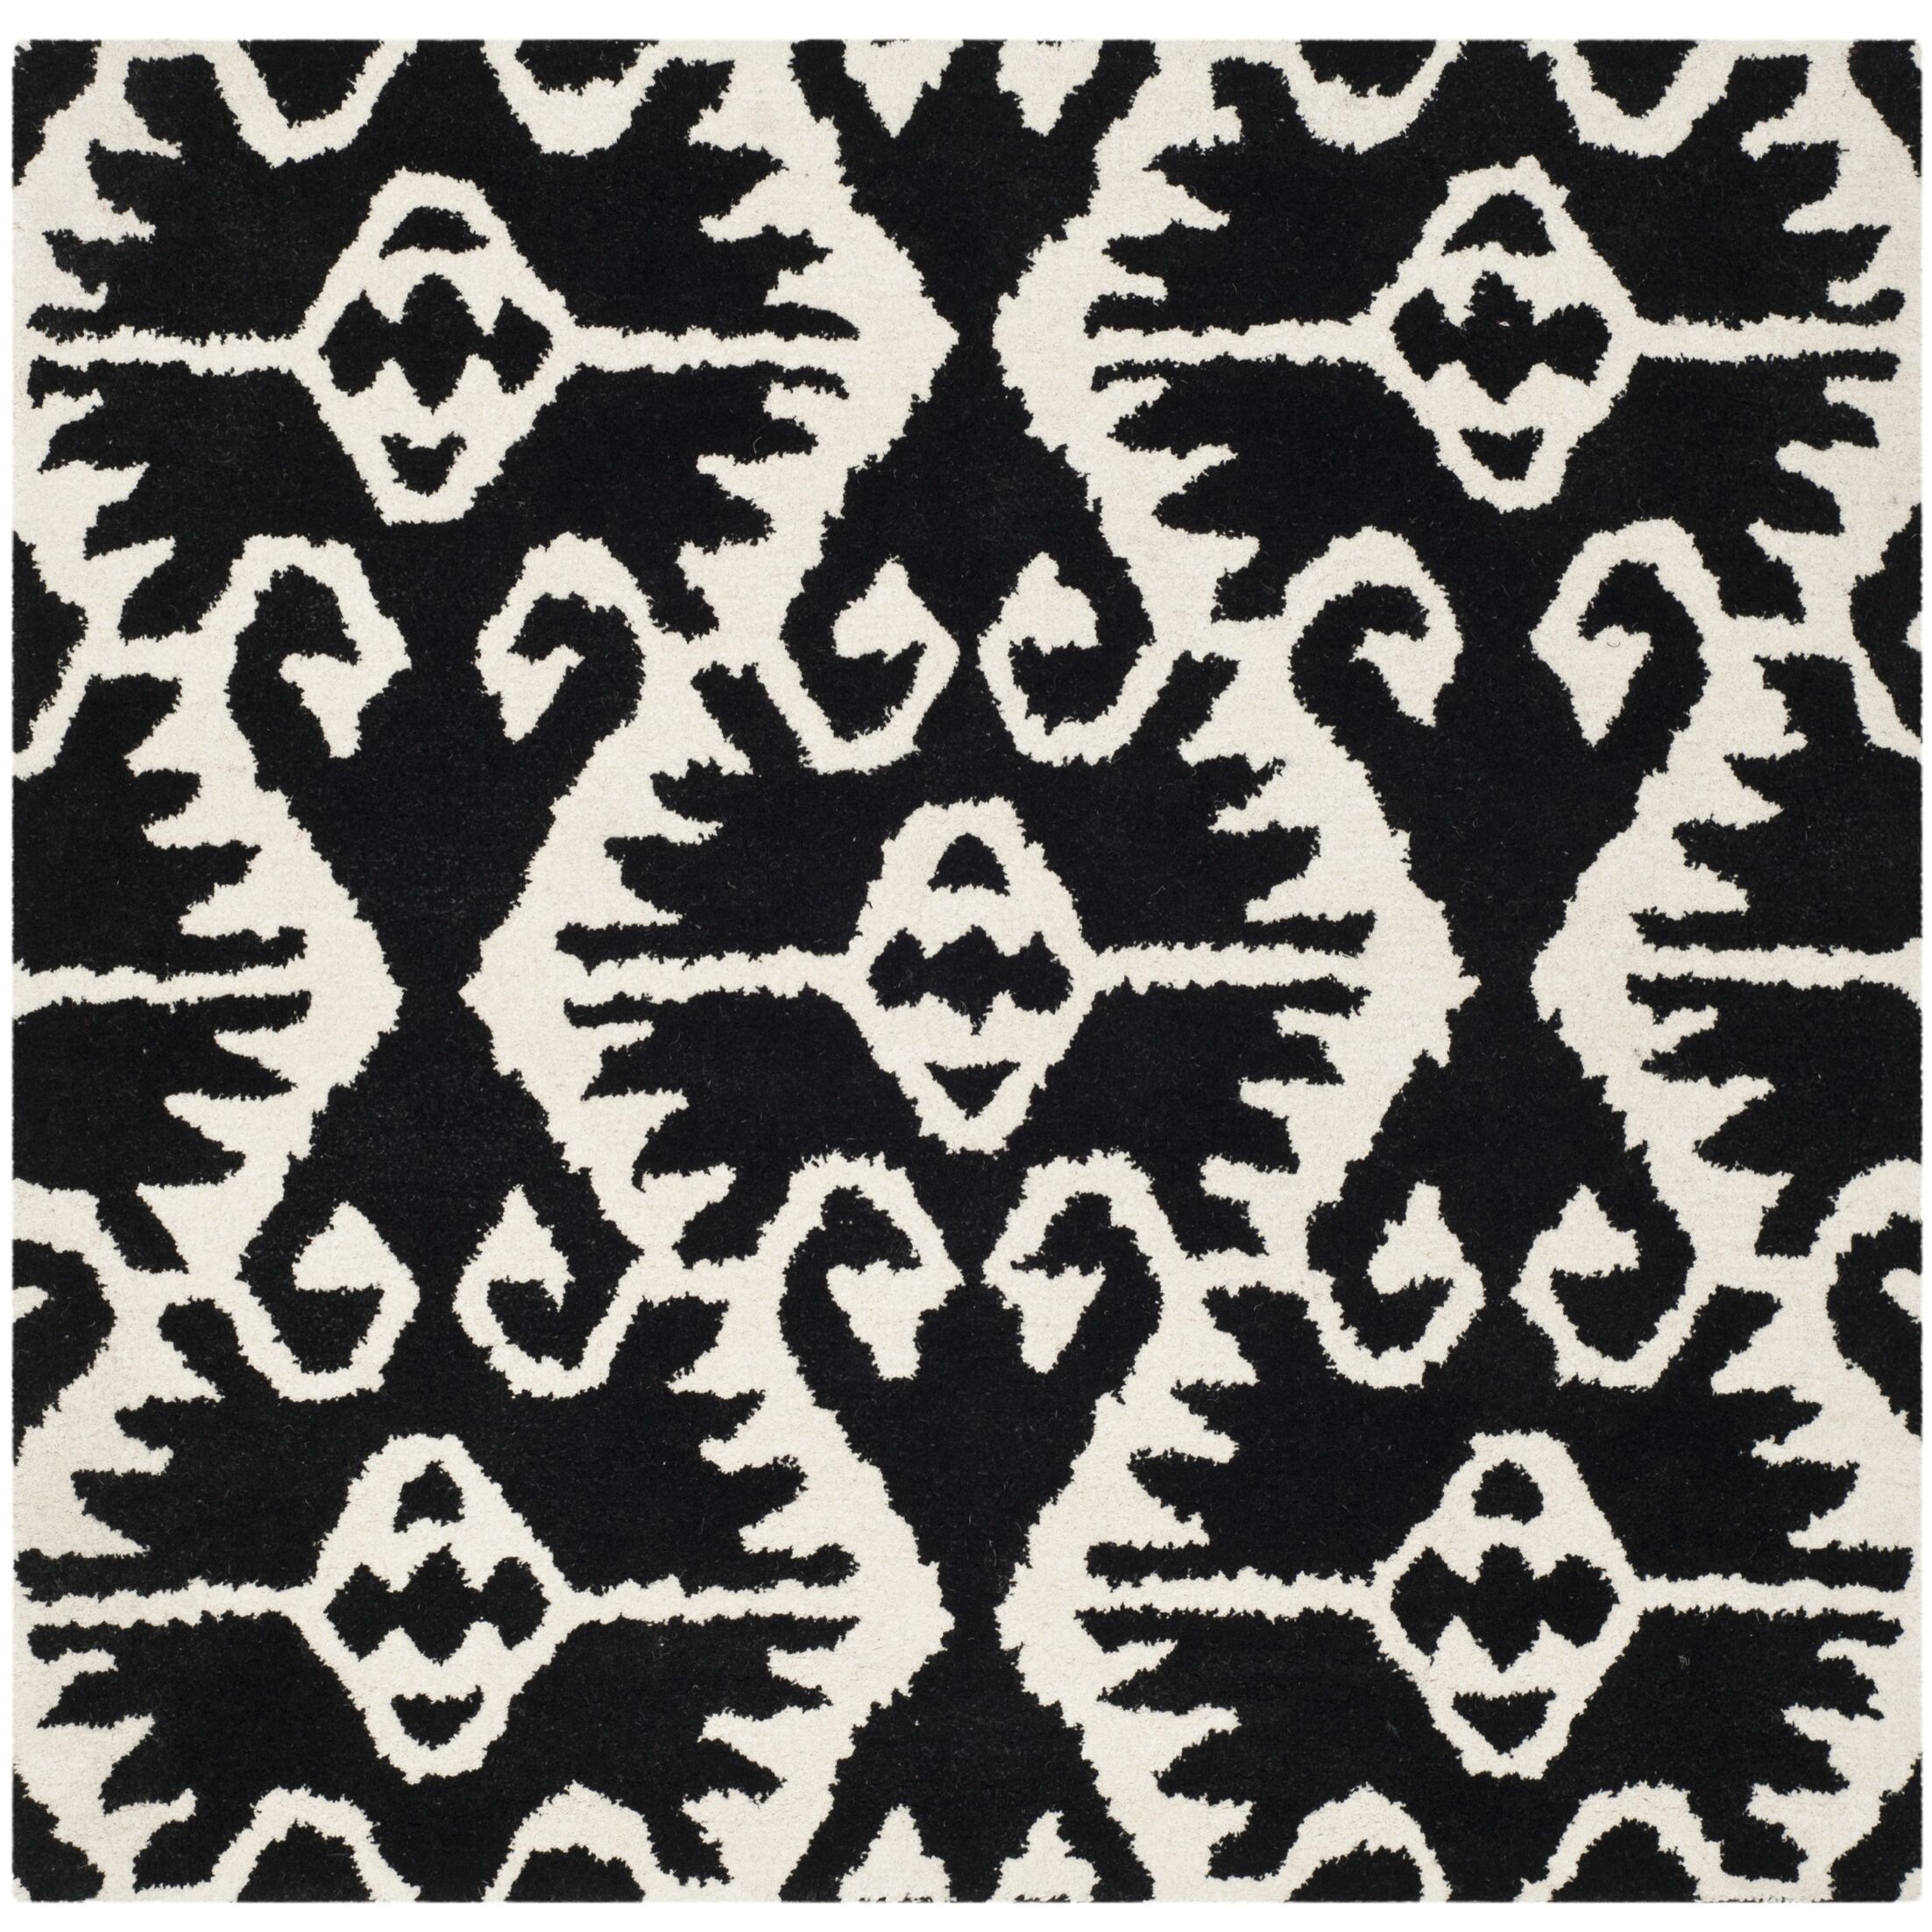 Kouerga Black & Ivory Area Rug Rug Size: Square 5'